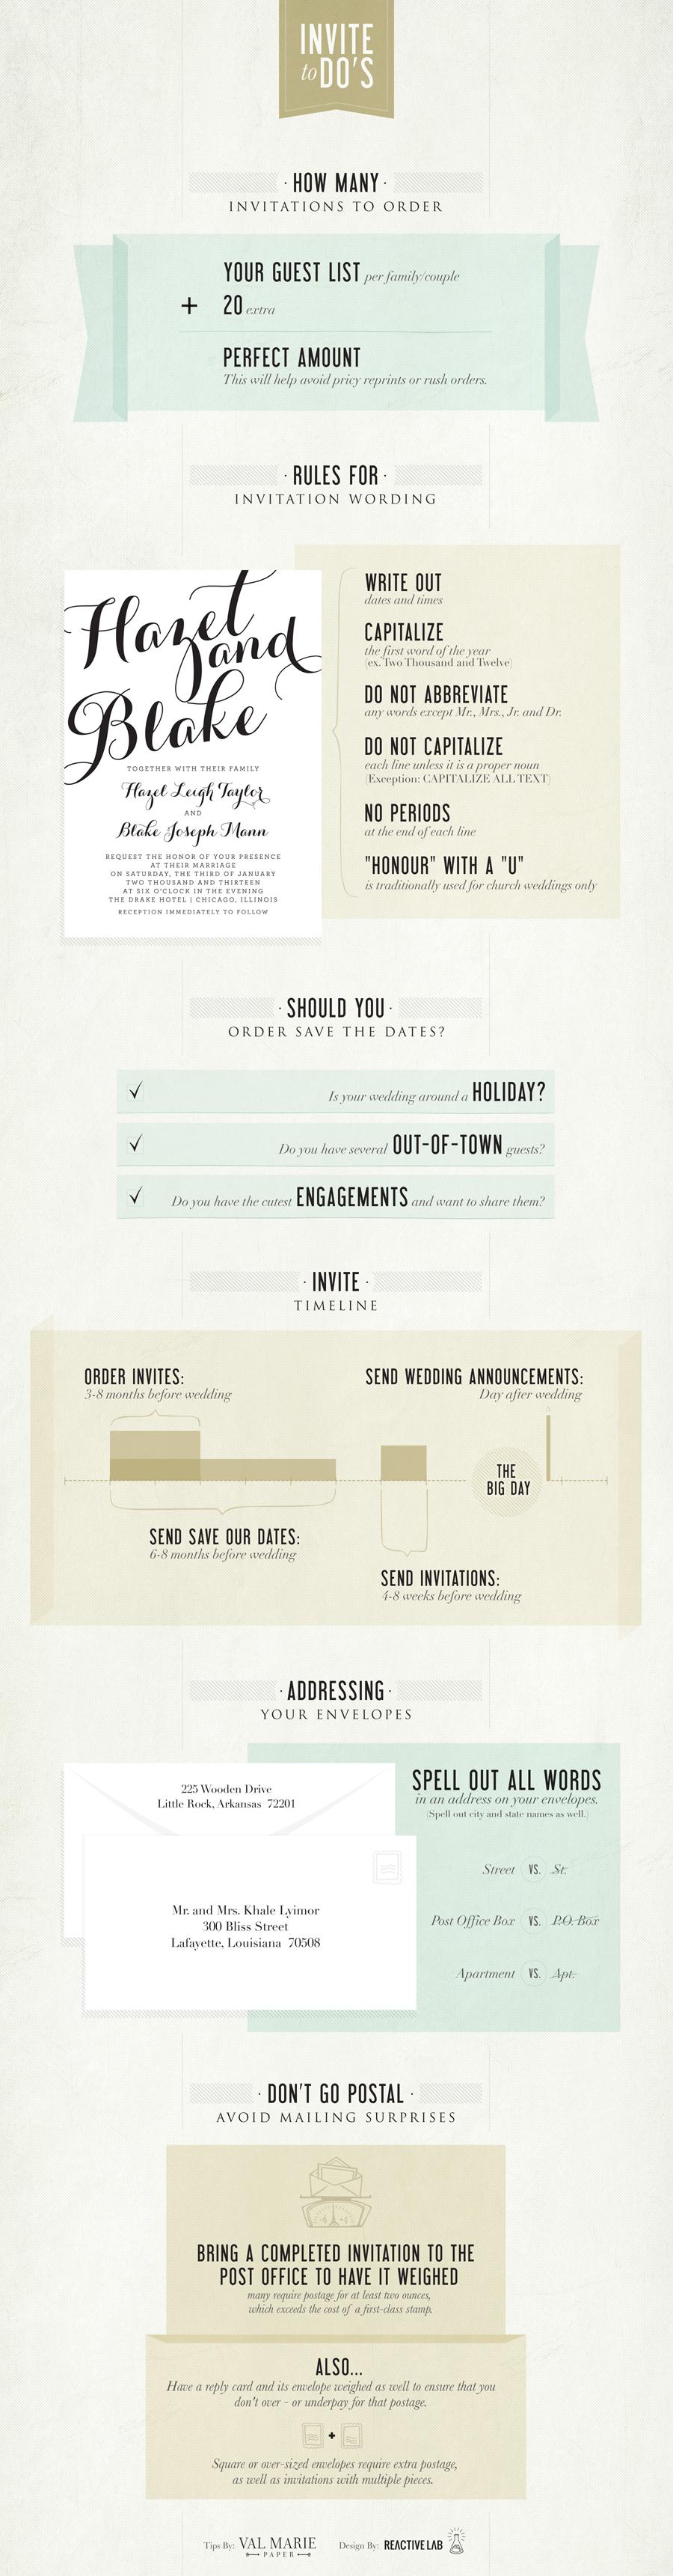 Wedding Invitations: Everything You Need To Know! via TheELD.com